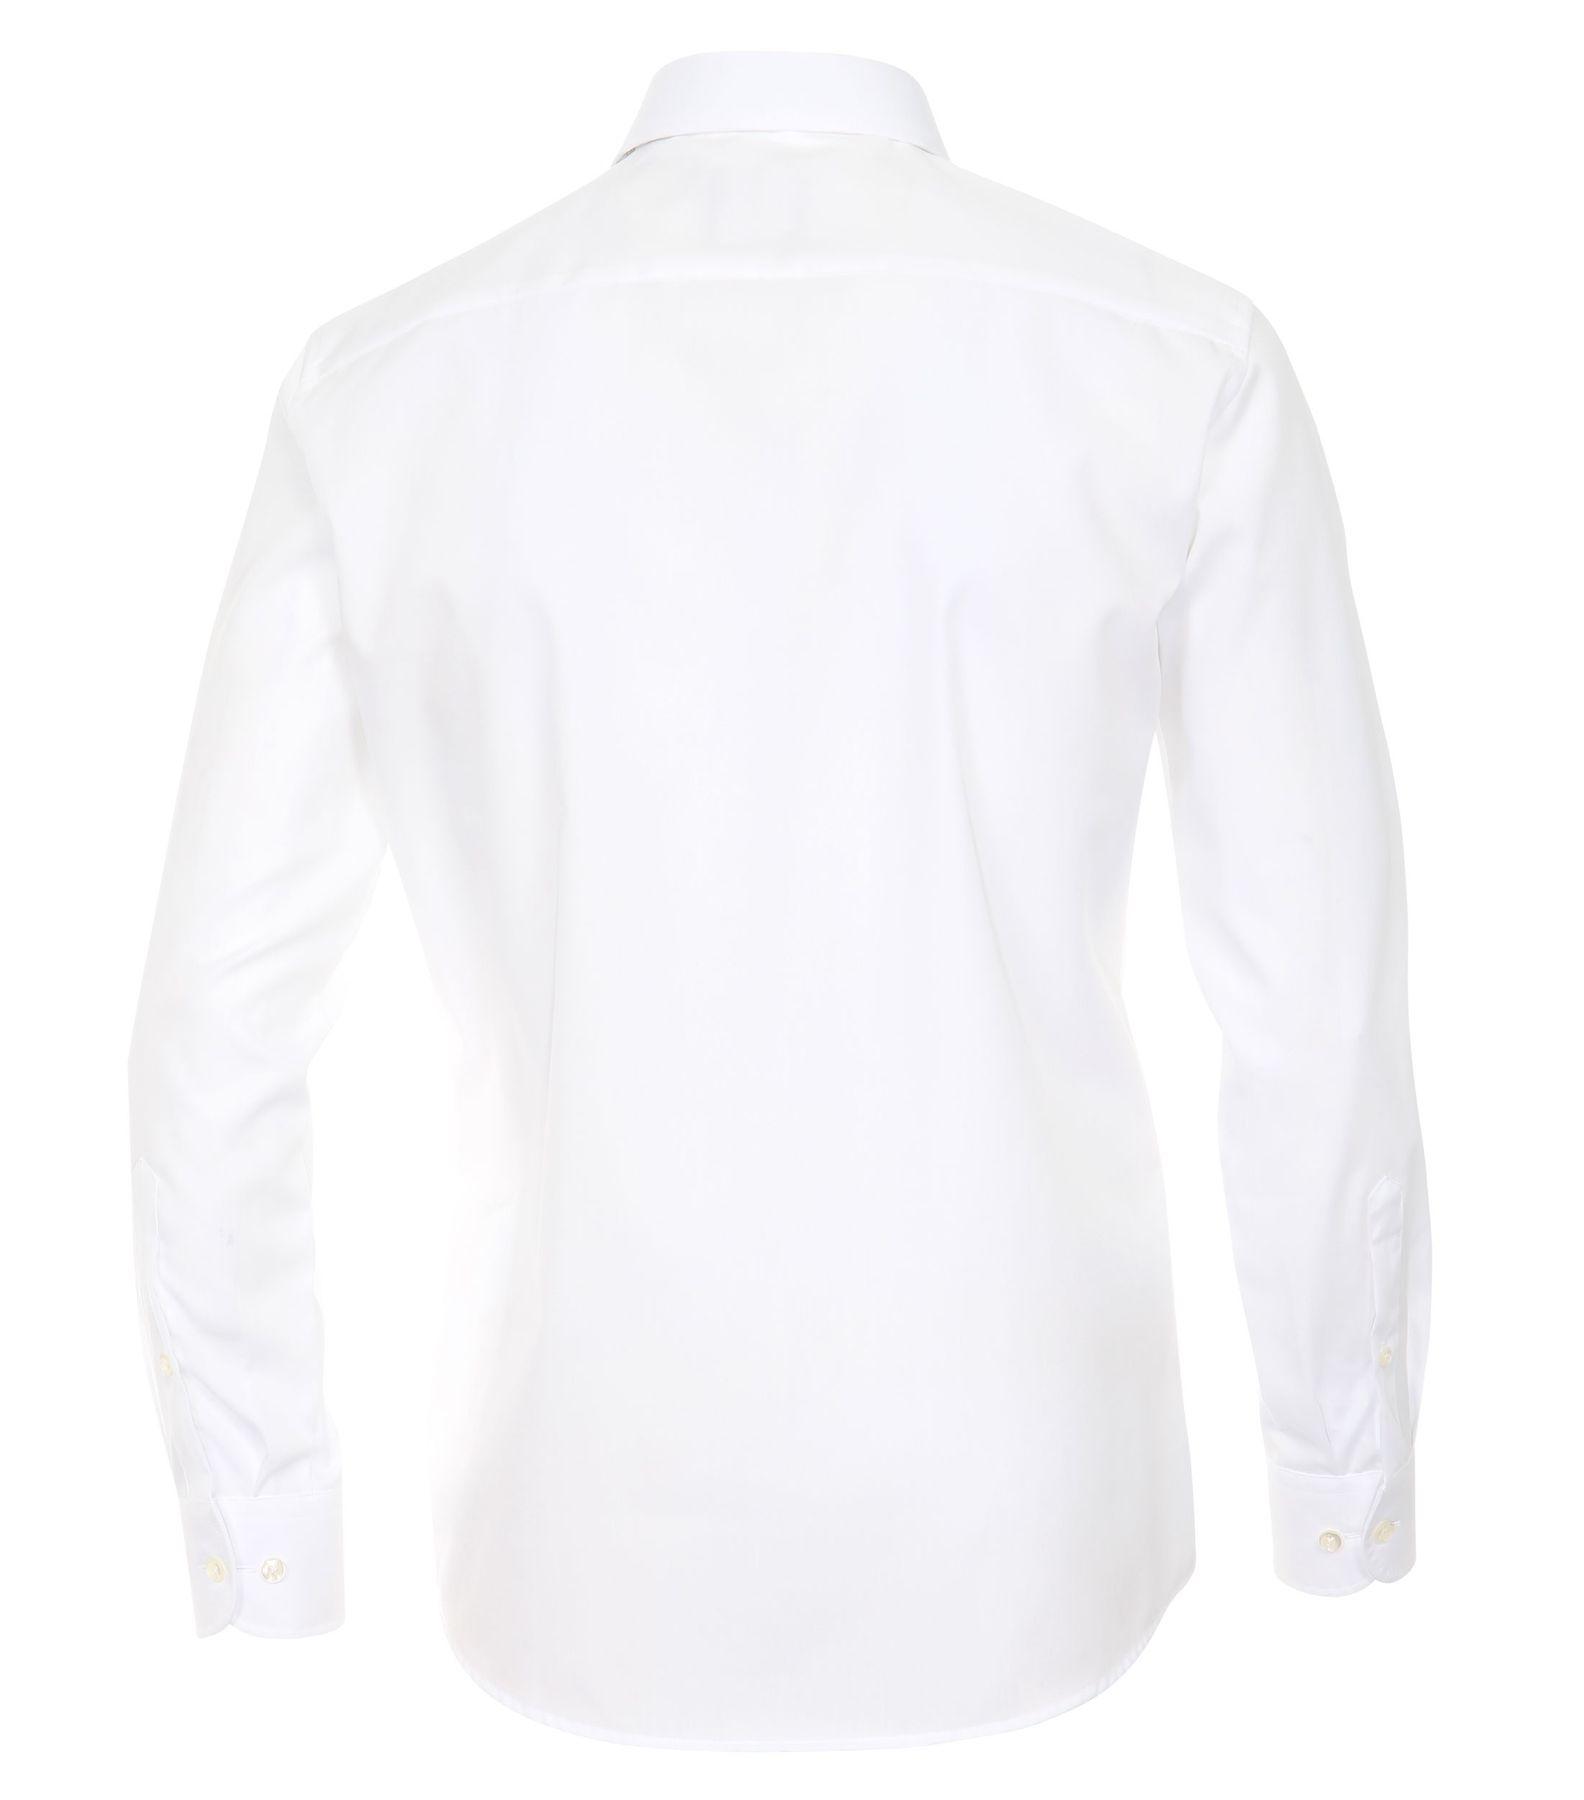 Casa Moda - Modern Fit - Bügelfreies Herren Business langarm Hemd in verschiedene Farben (006550) – Bild 7